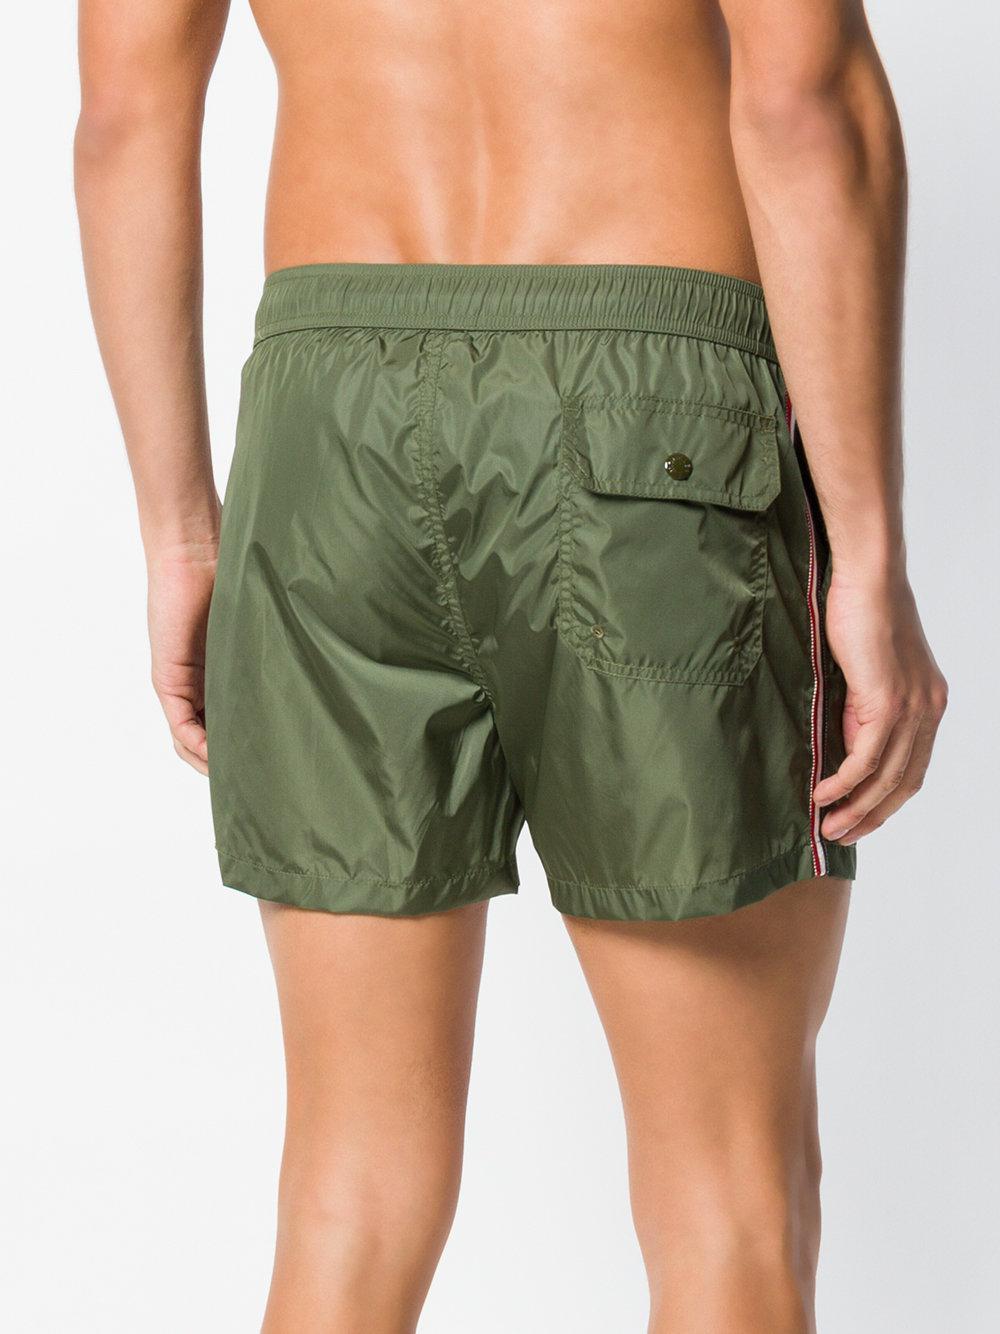 a5b3c62fec47 Lyst - Moncler Striped Trim Swim Shorts in Green for Men